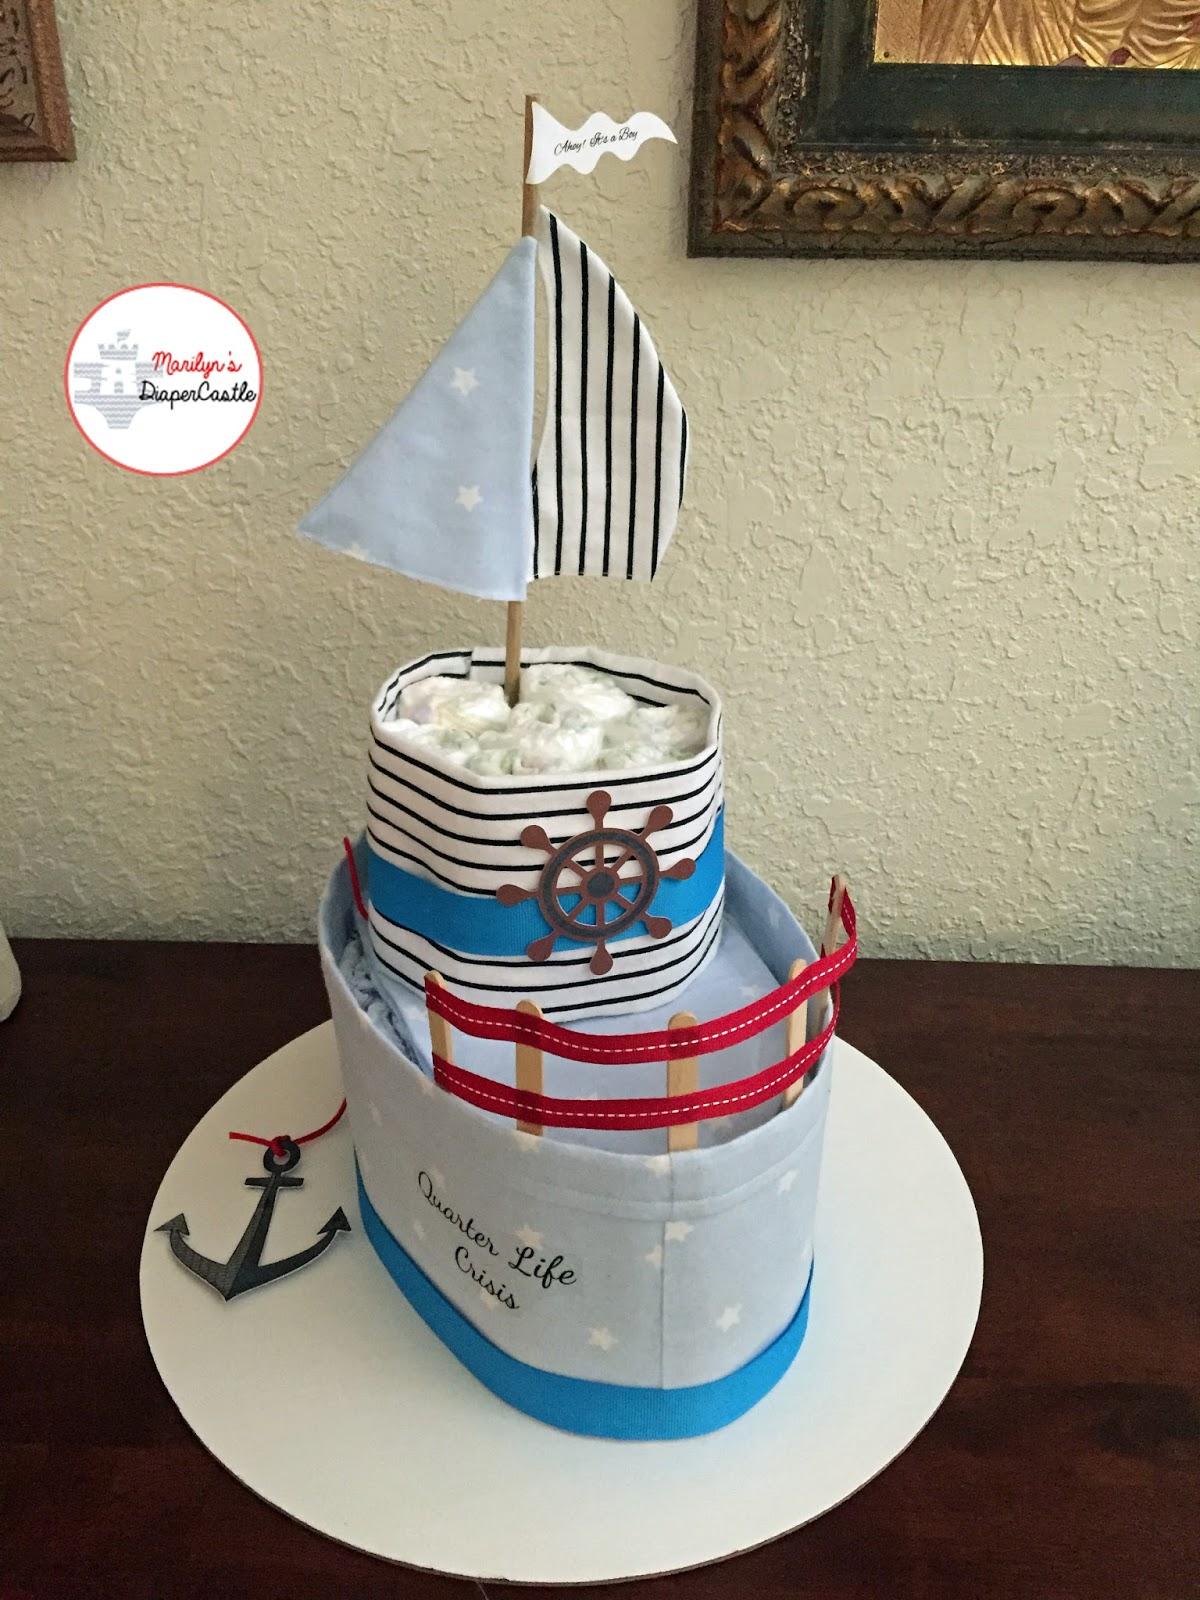 Marilyn S Diaper Castle Boat Diaper Cake